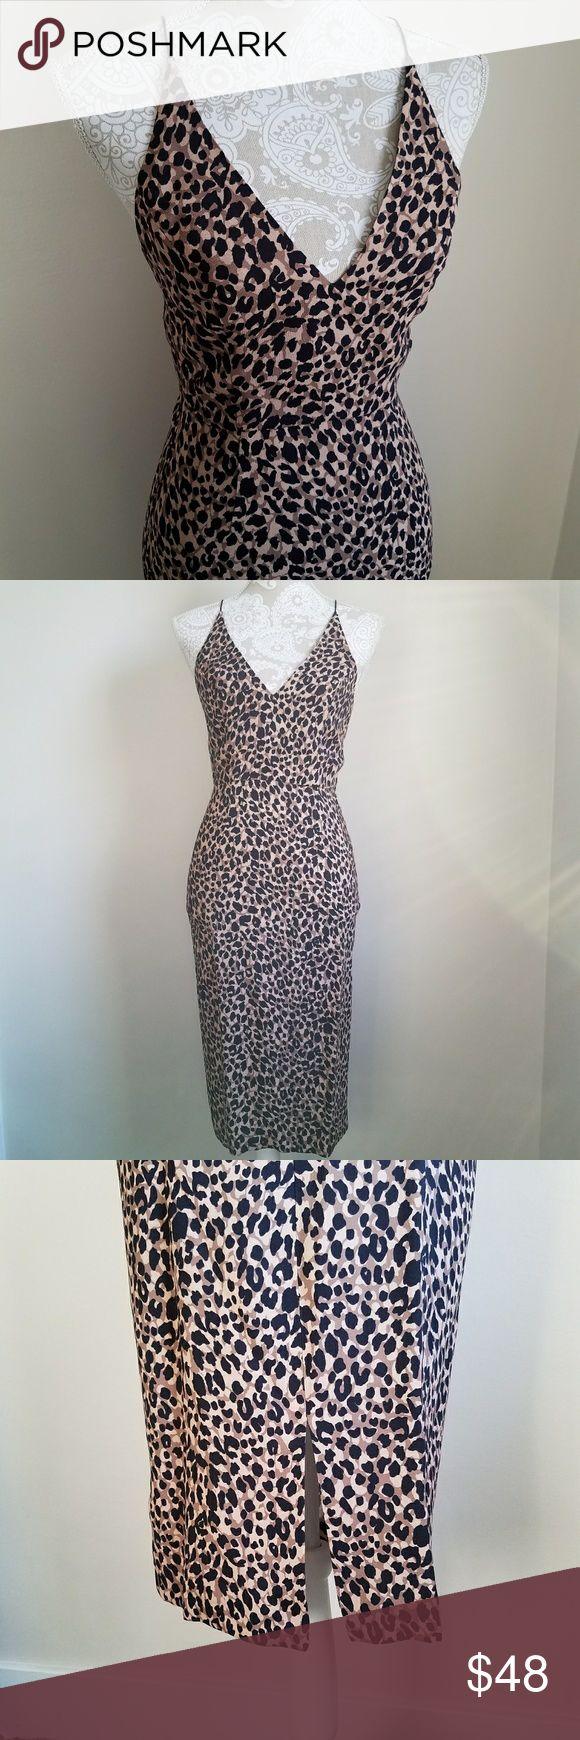 "TOPSHOP   animal print bodycon dress Cheetah print dress. Thin criss cross straps. Hidden zipper closure. Slit back of dress, about knee length.  US 2, UK 6 Length: 42"" Armpit-Armpit: 15.5"" *measurements are approximate* Topshop Dresses Midi"